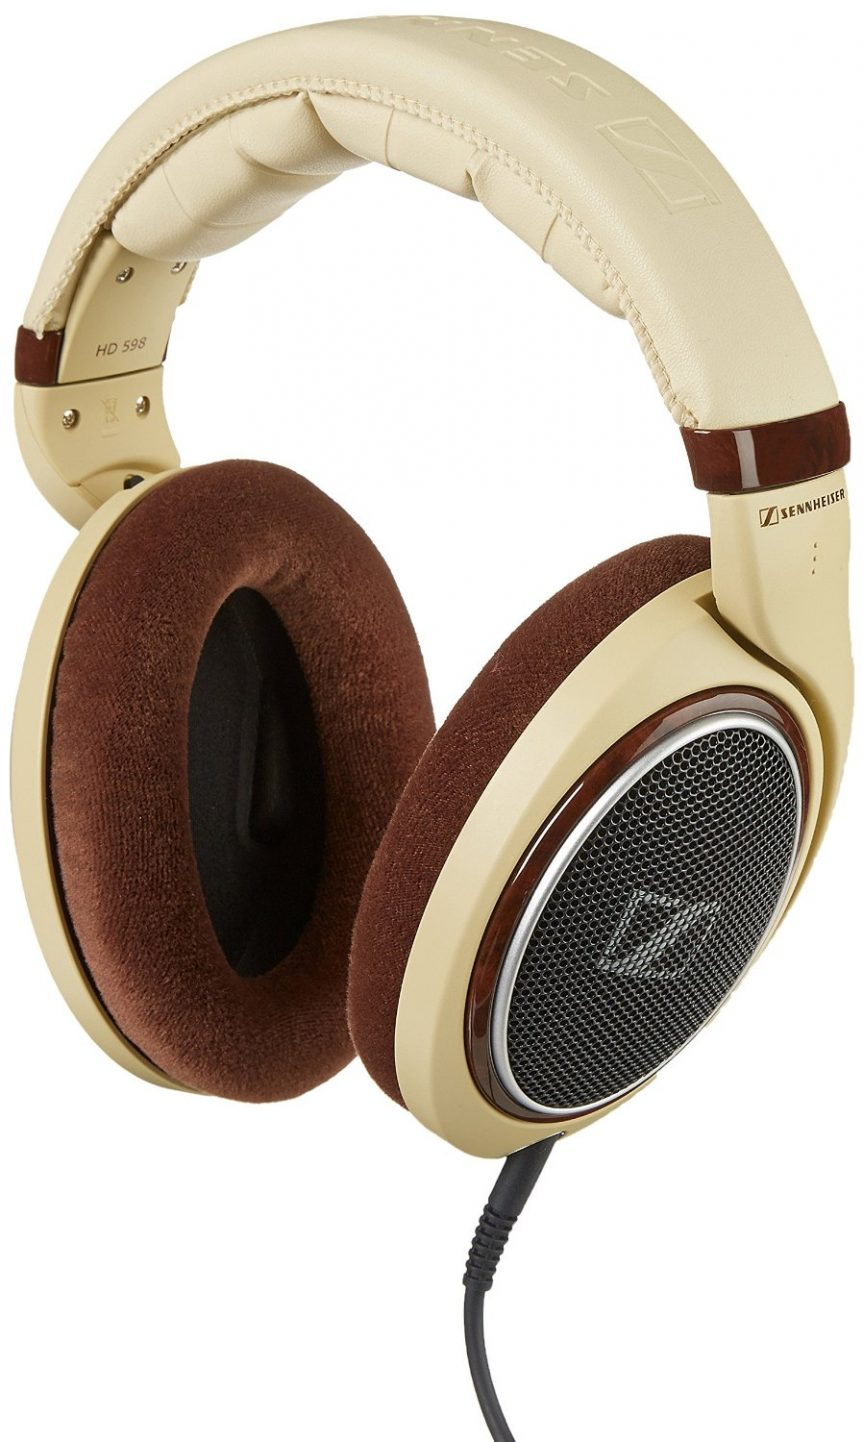 Comfortable headset